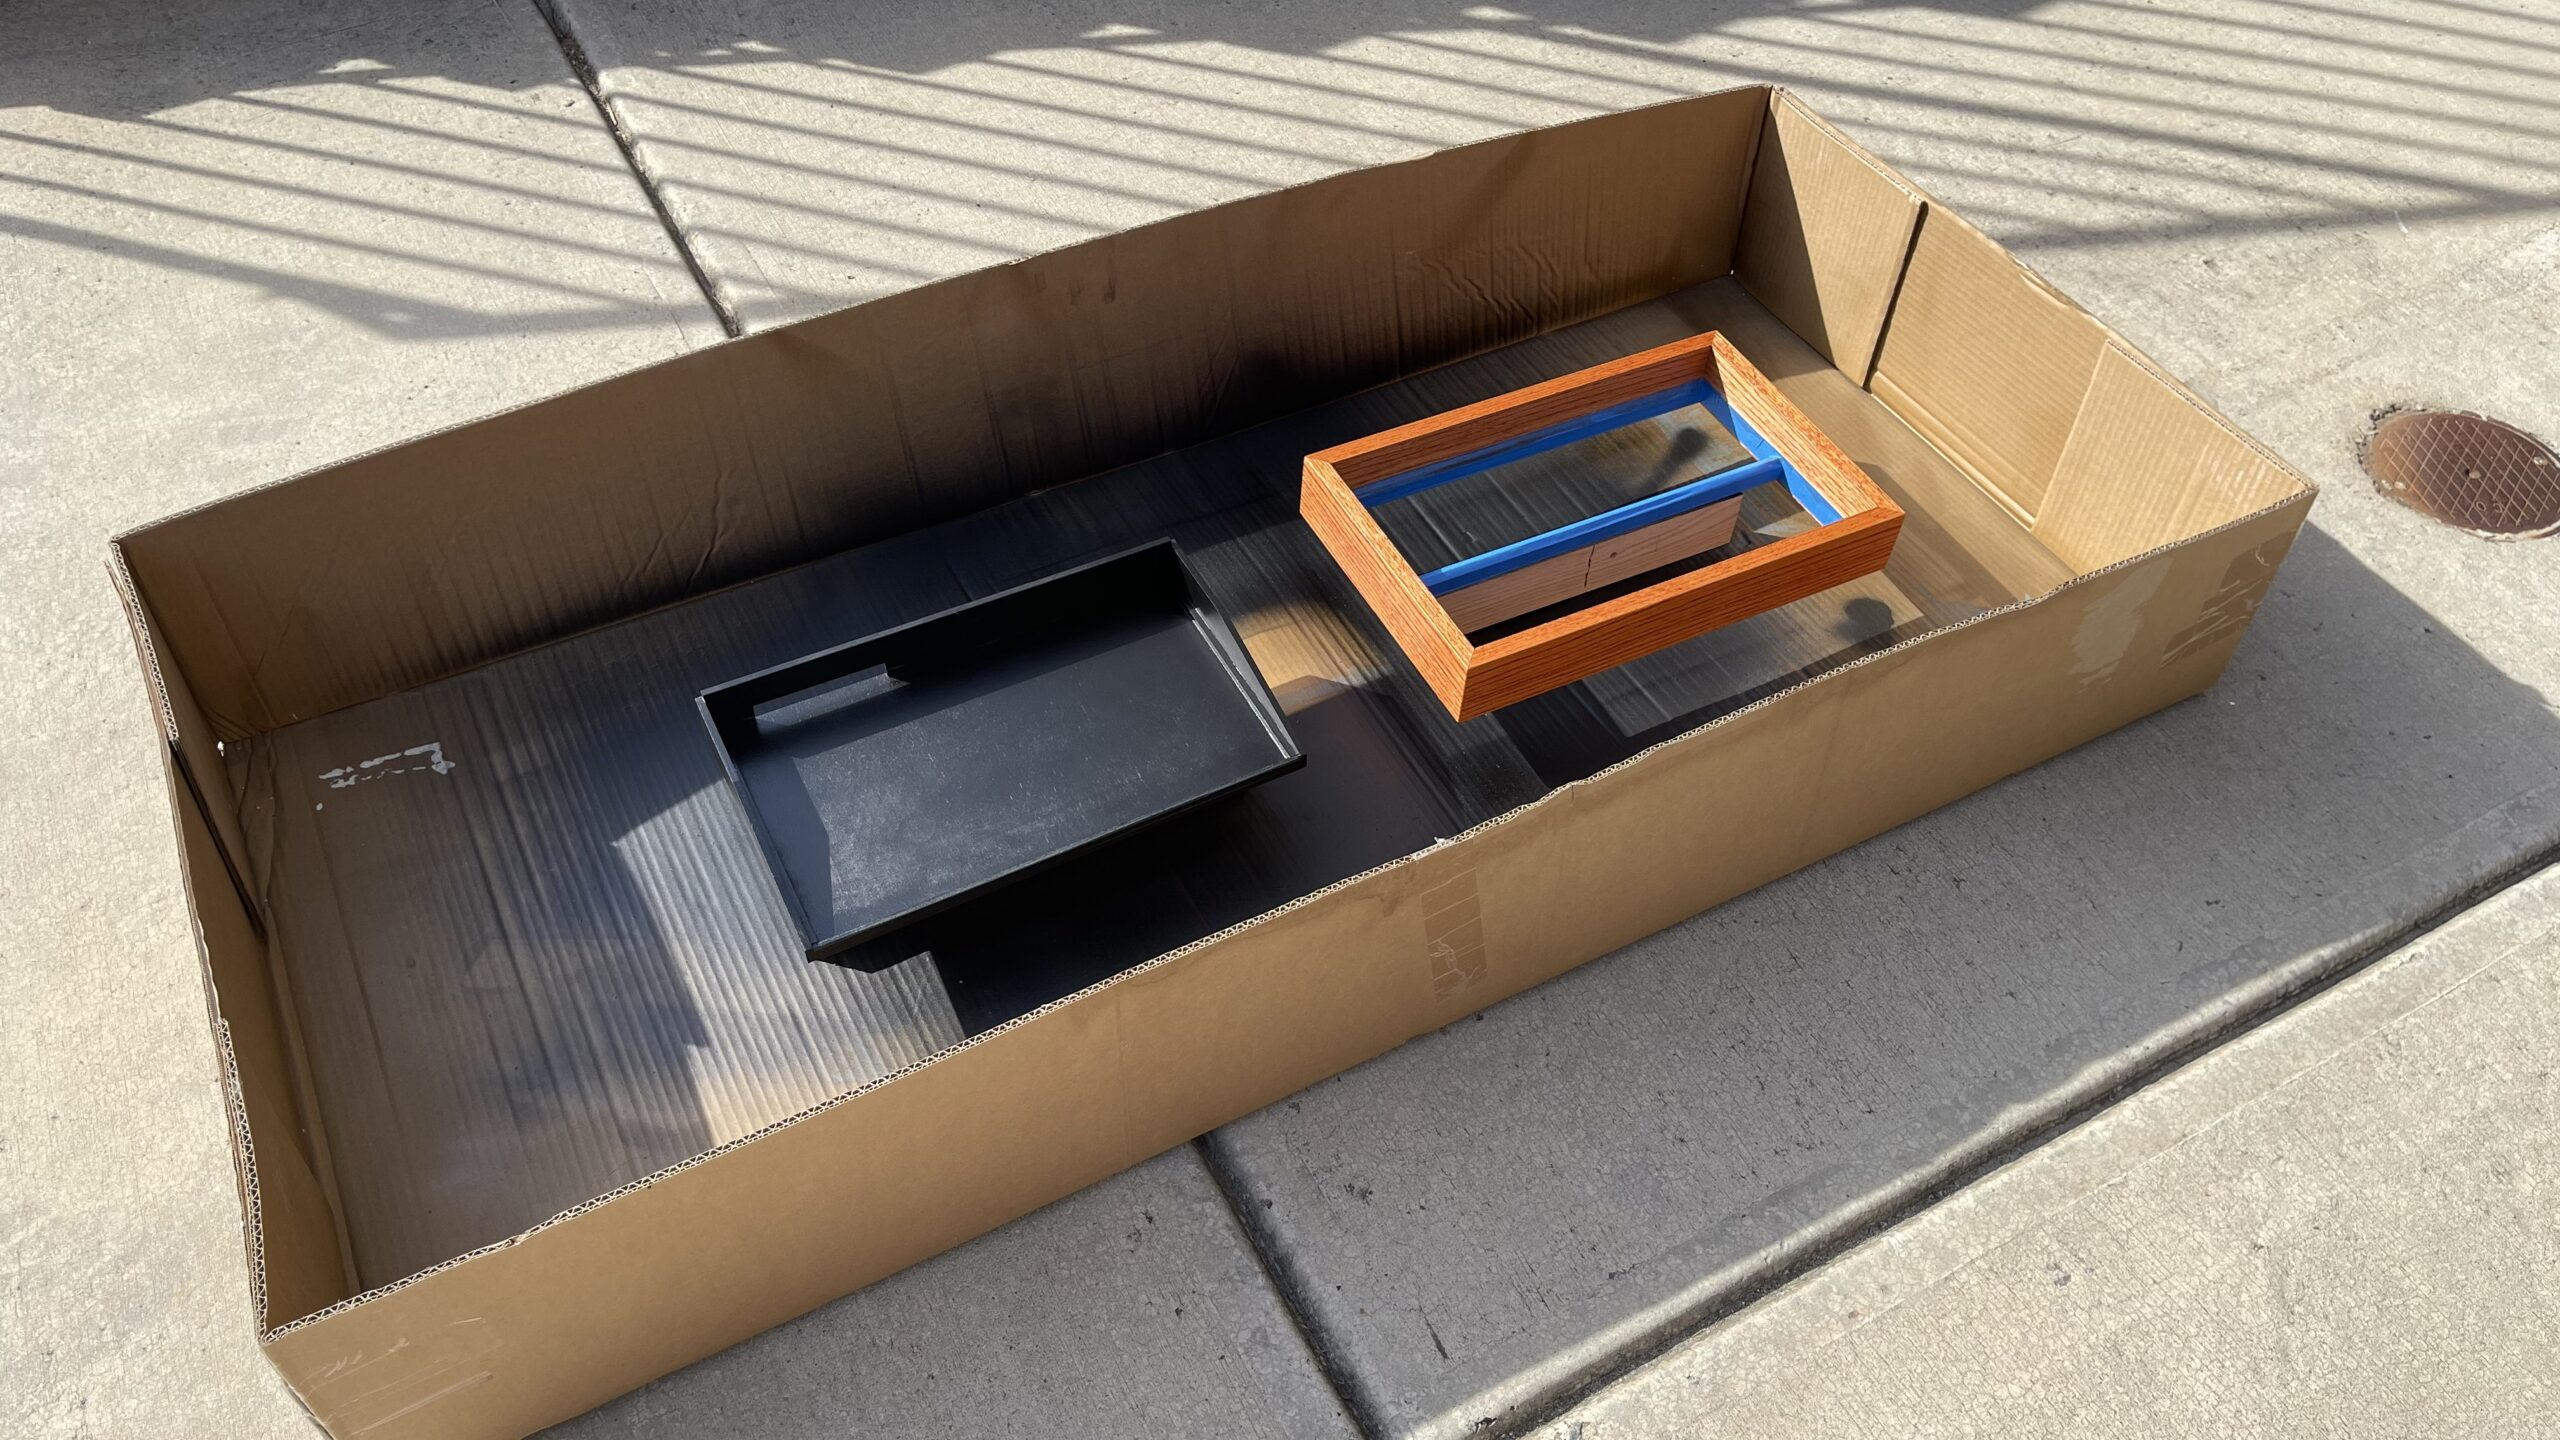 DIY eurorack modular synth case sketchup moog subharmonicon dfam